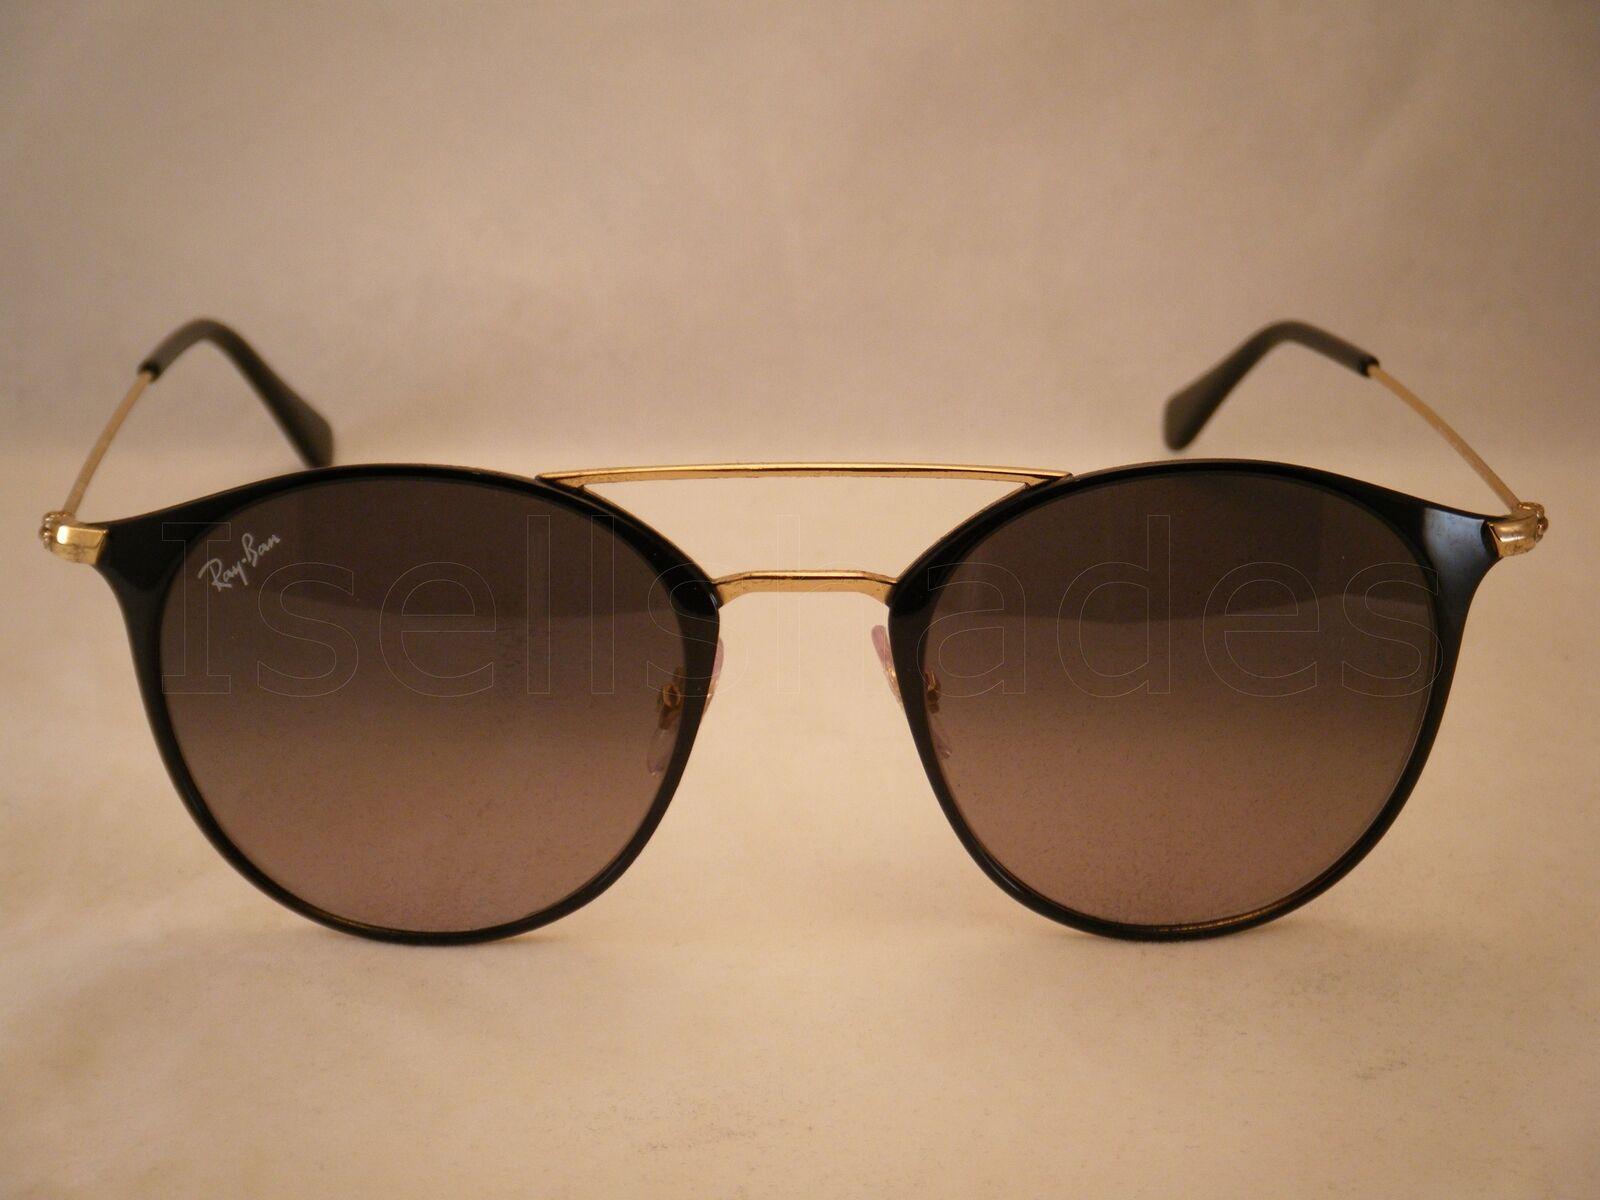 6aa489afc Ray-Ban Rb3546 187/71 Gold Black Frame Crystal Grey Shaded Lens ...